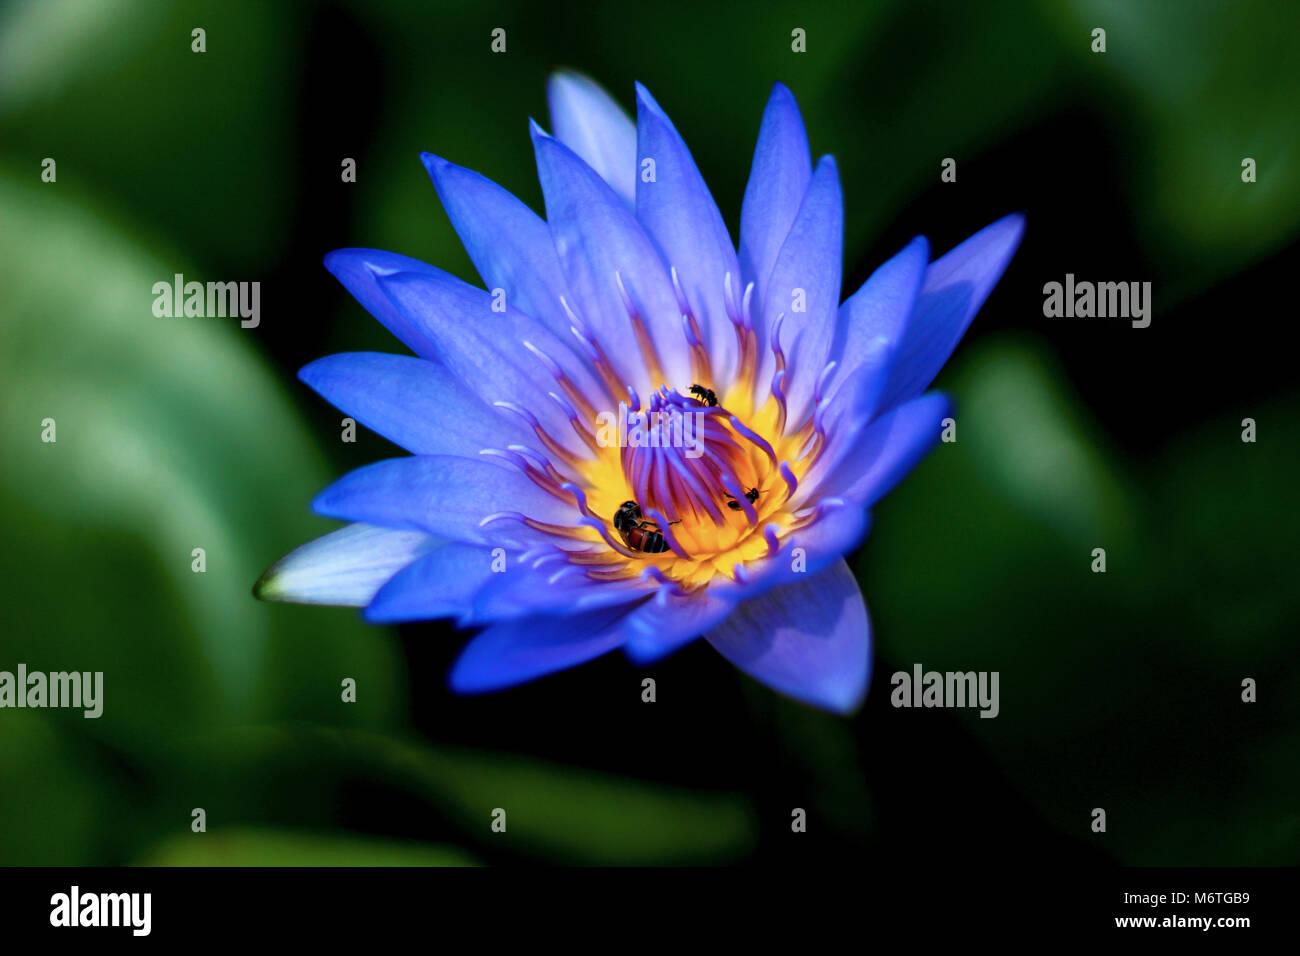 Blue Lotus Flower Stock Photo 176331325 Alamy